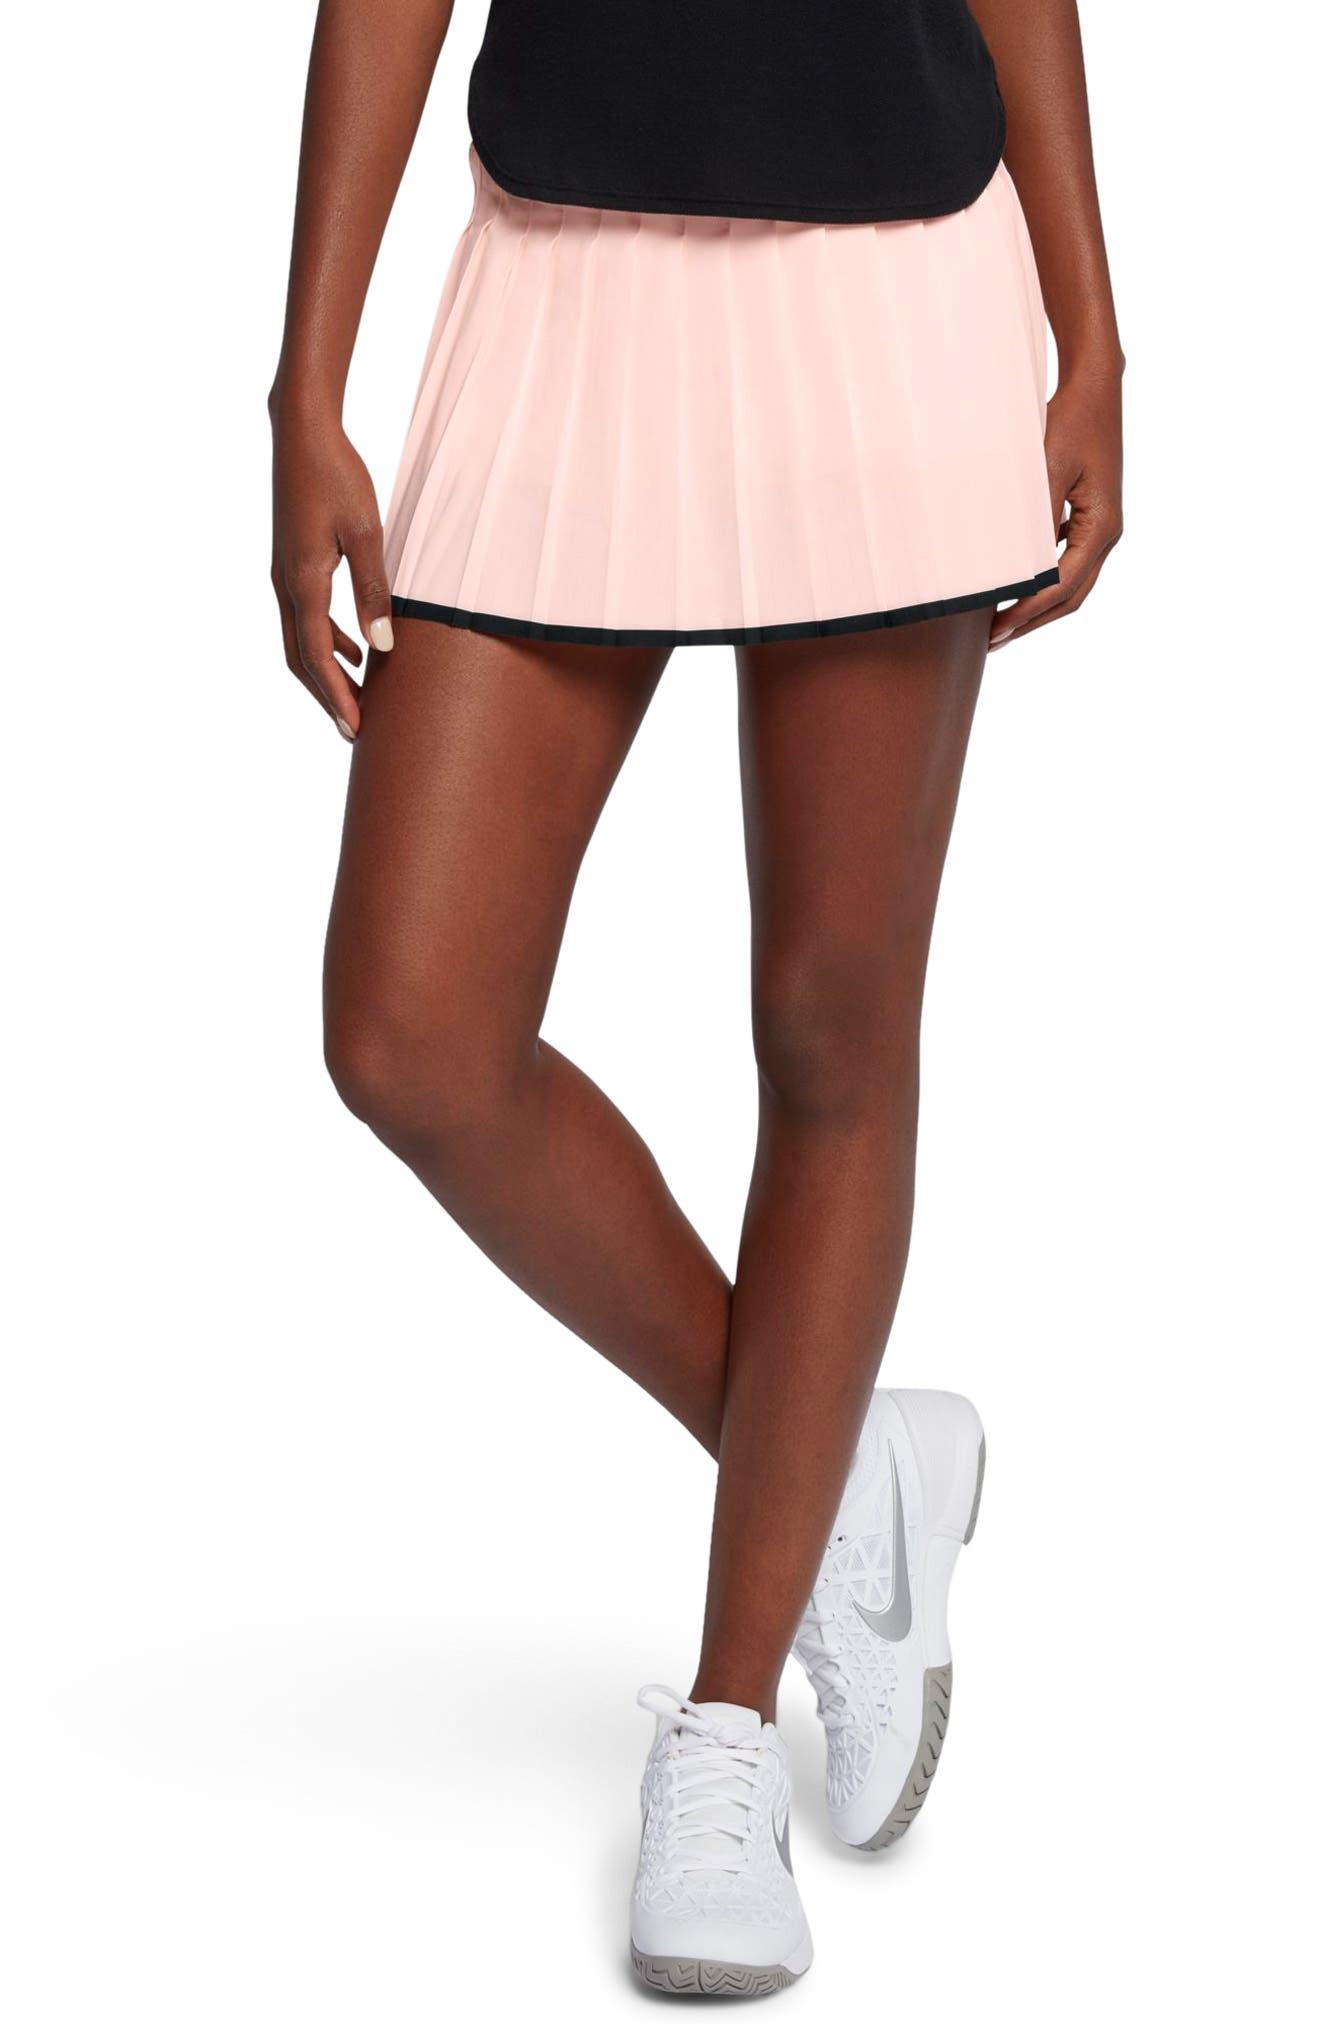 Women's Court Victory Tennis Skirt,                         Main,                         color, Sunset Tint/ Black/ Black